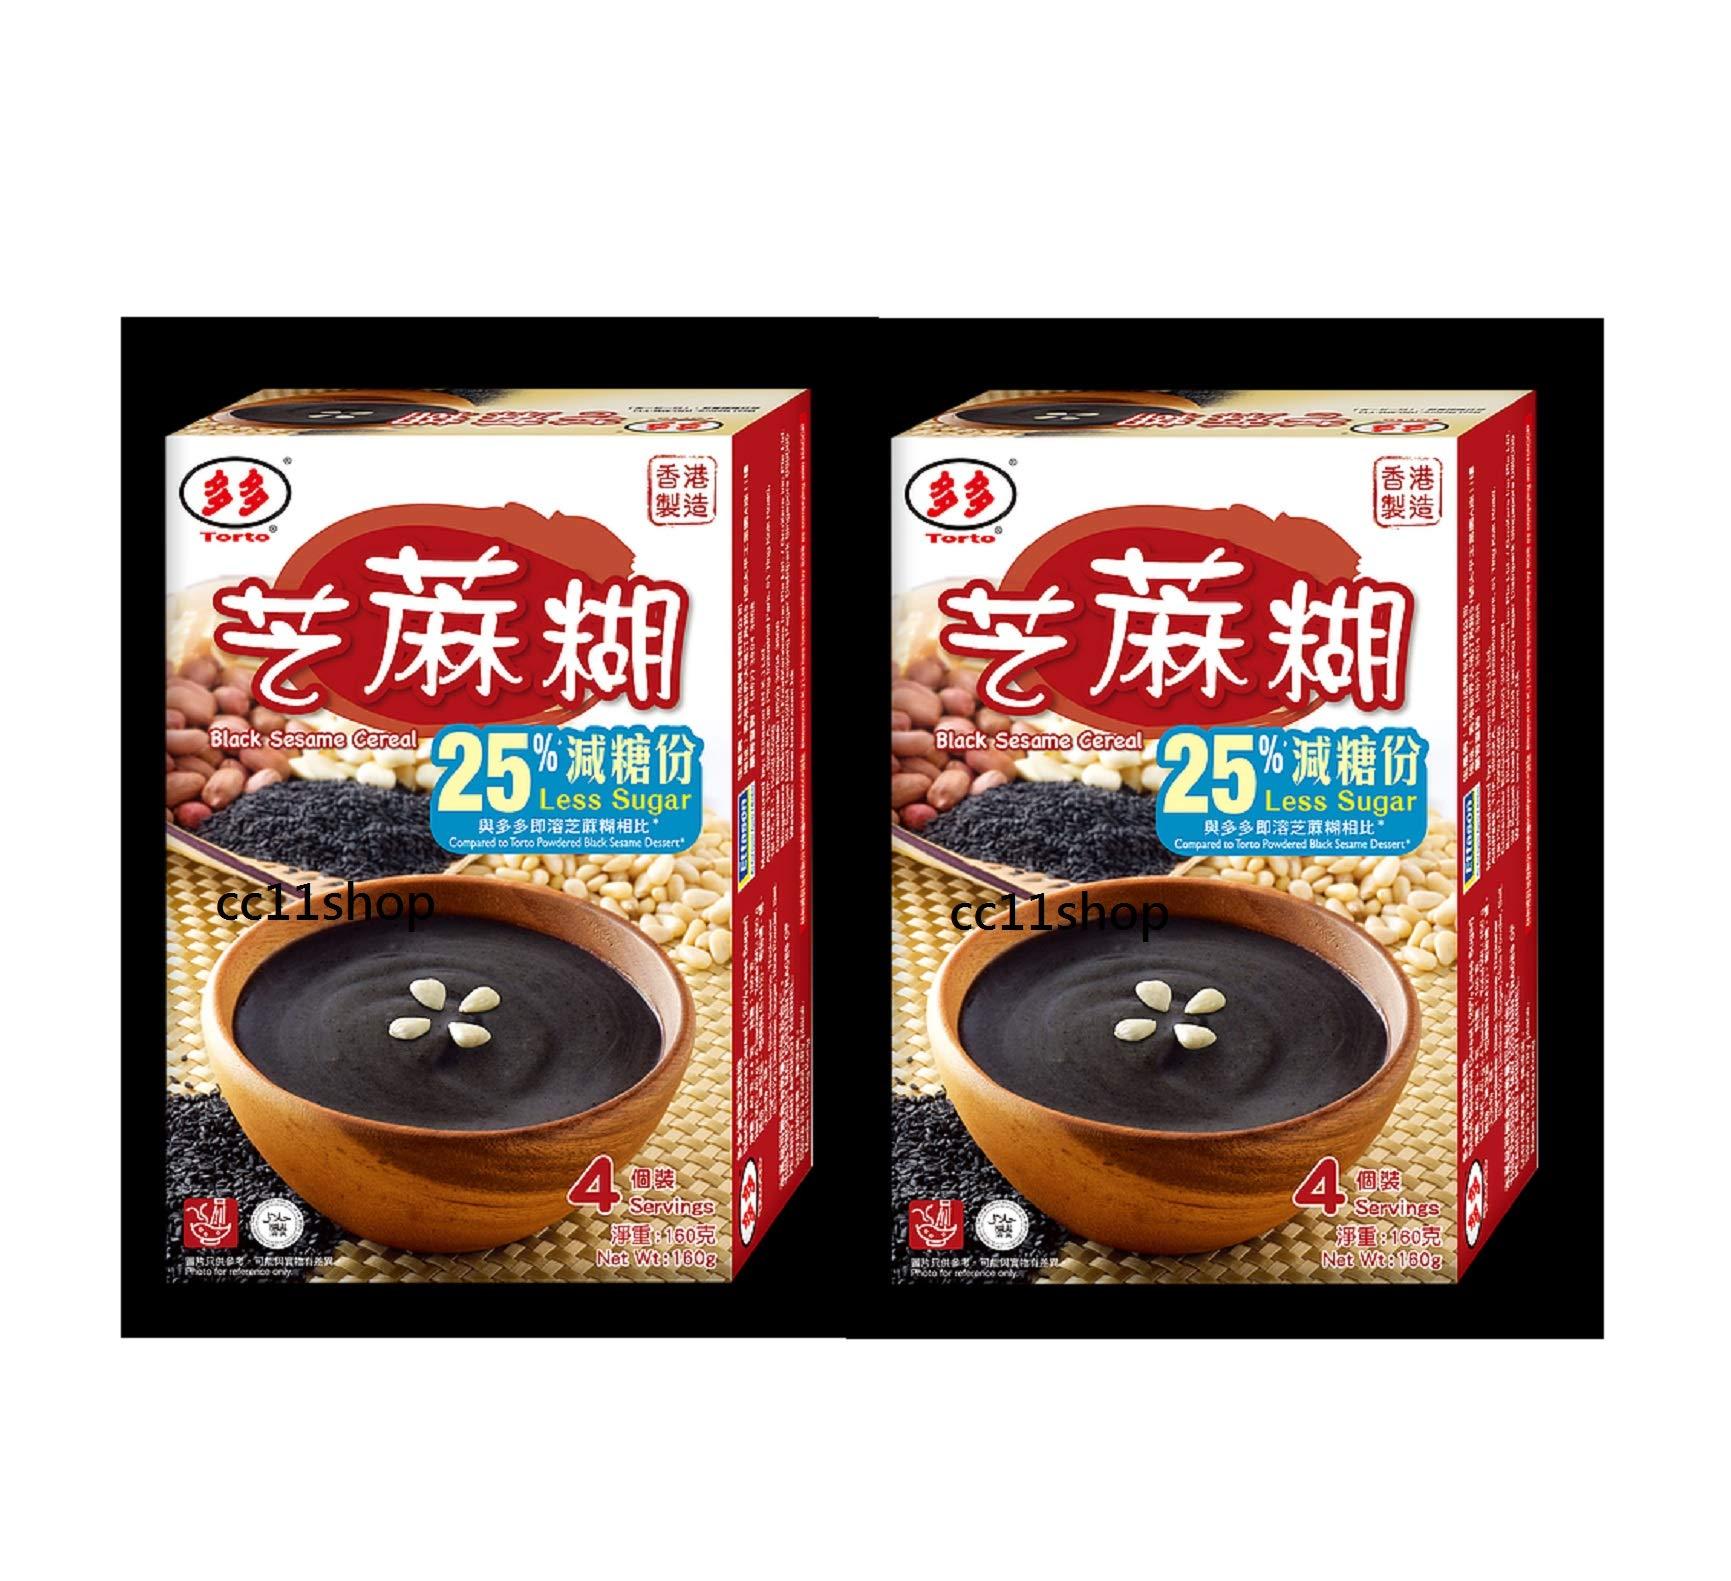 25% Less Sugar Torto Black Sesame Instant Dessert 40g x 8 servings